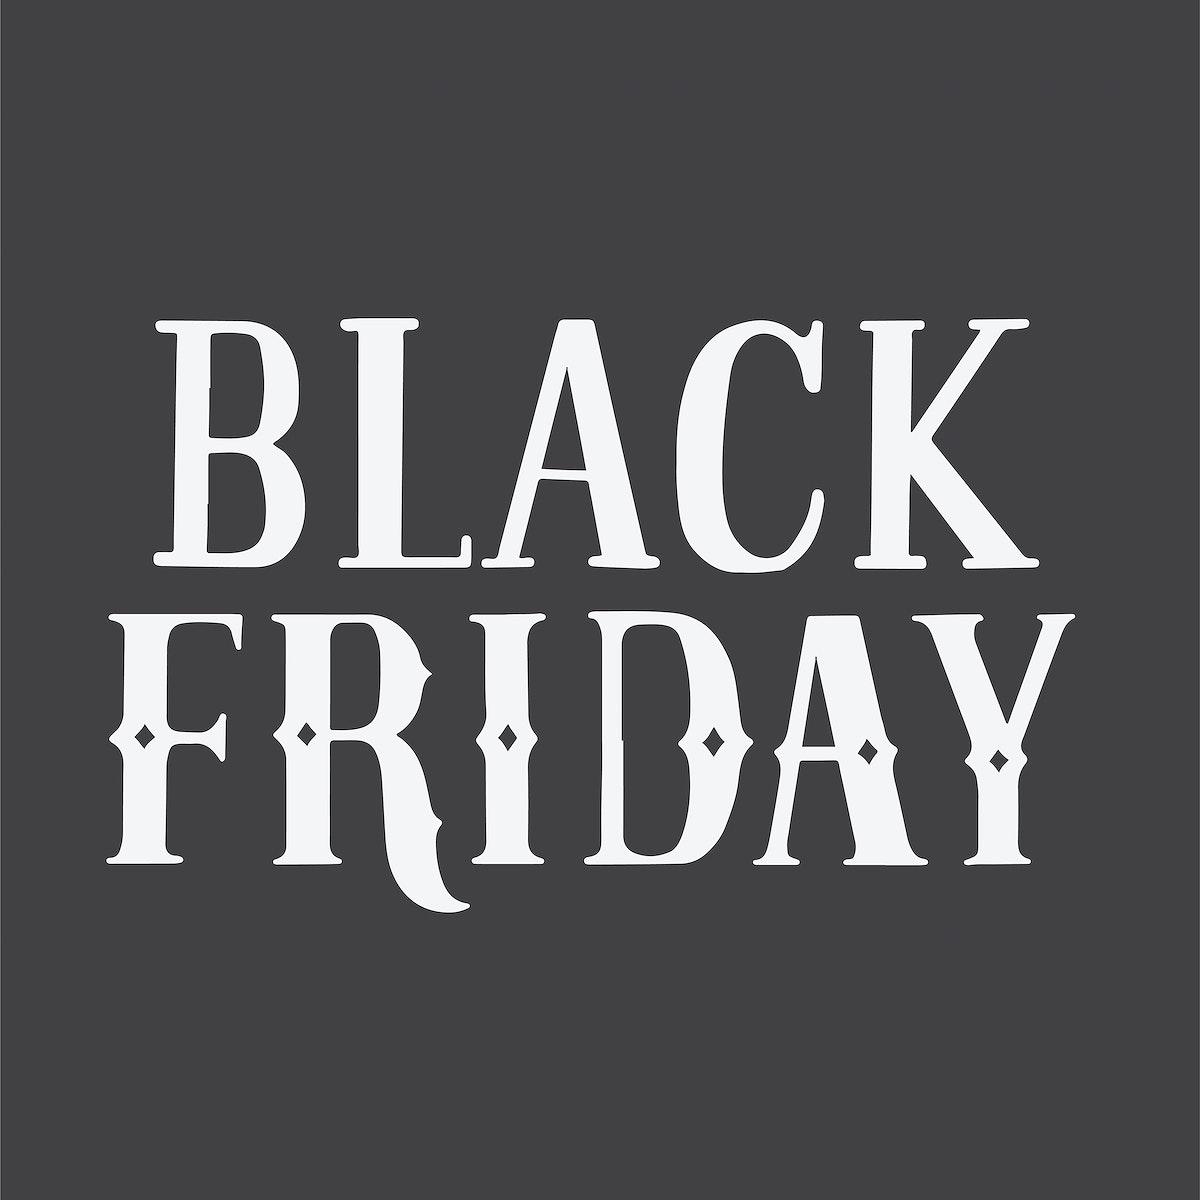 Handwritten style of Black Friday typography